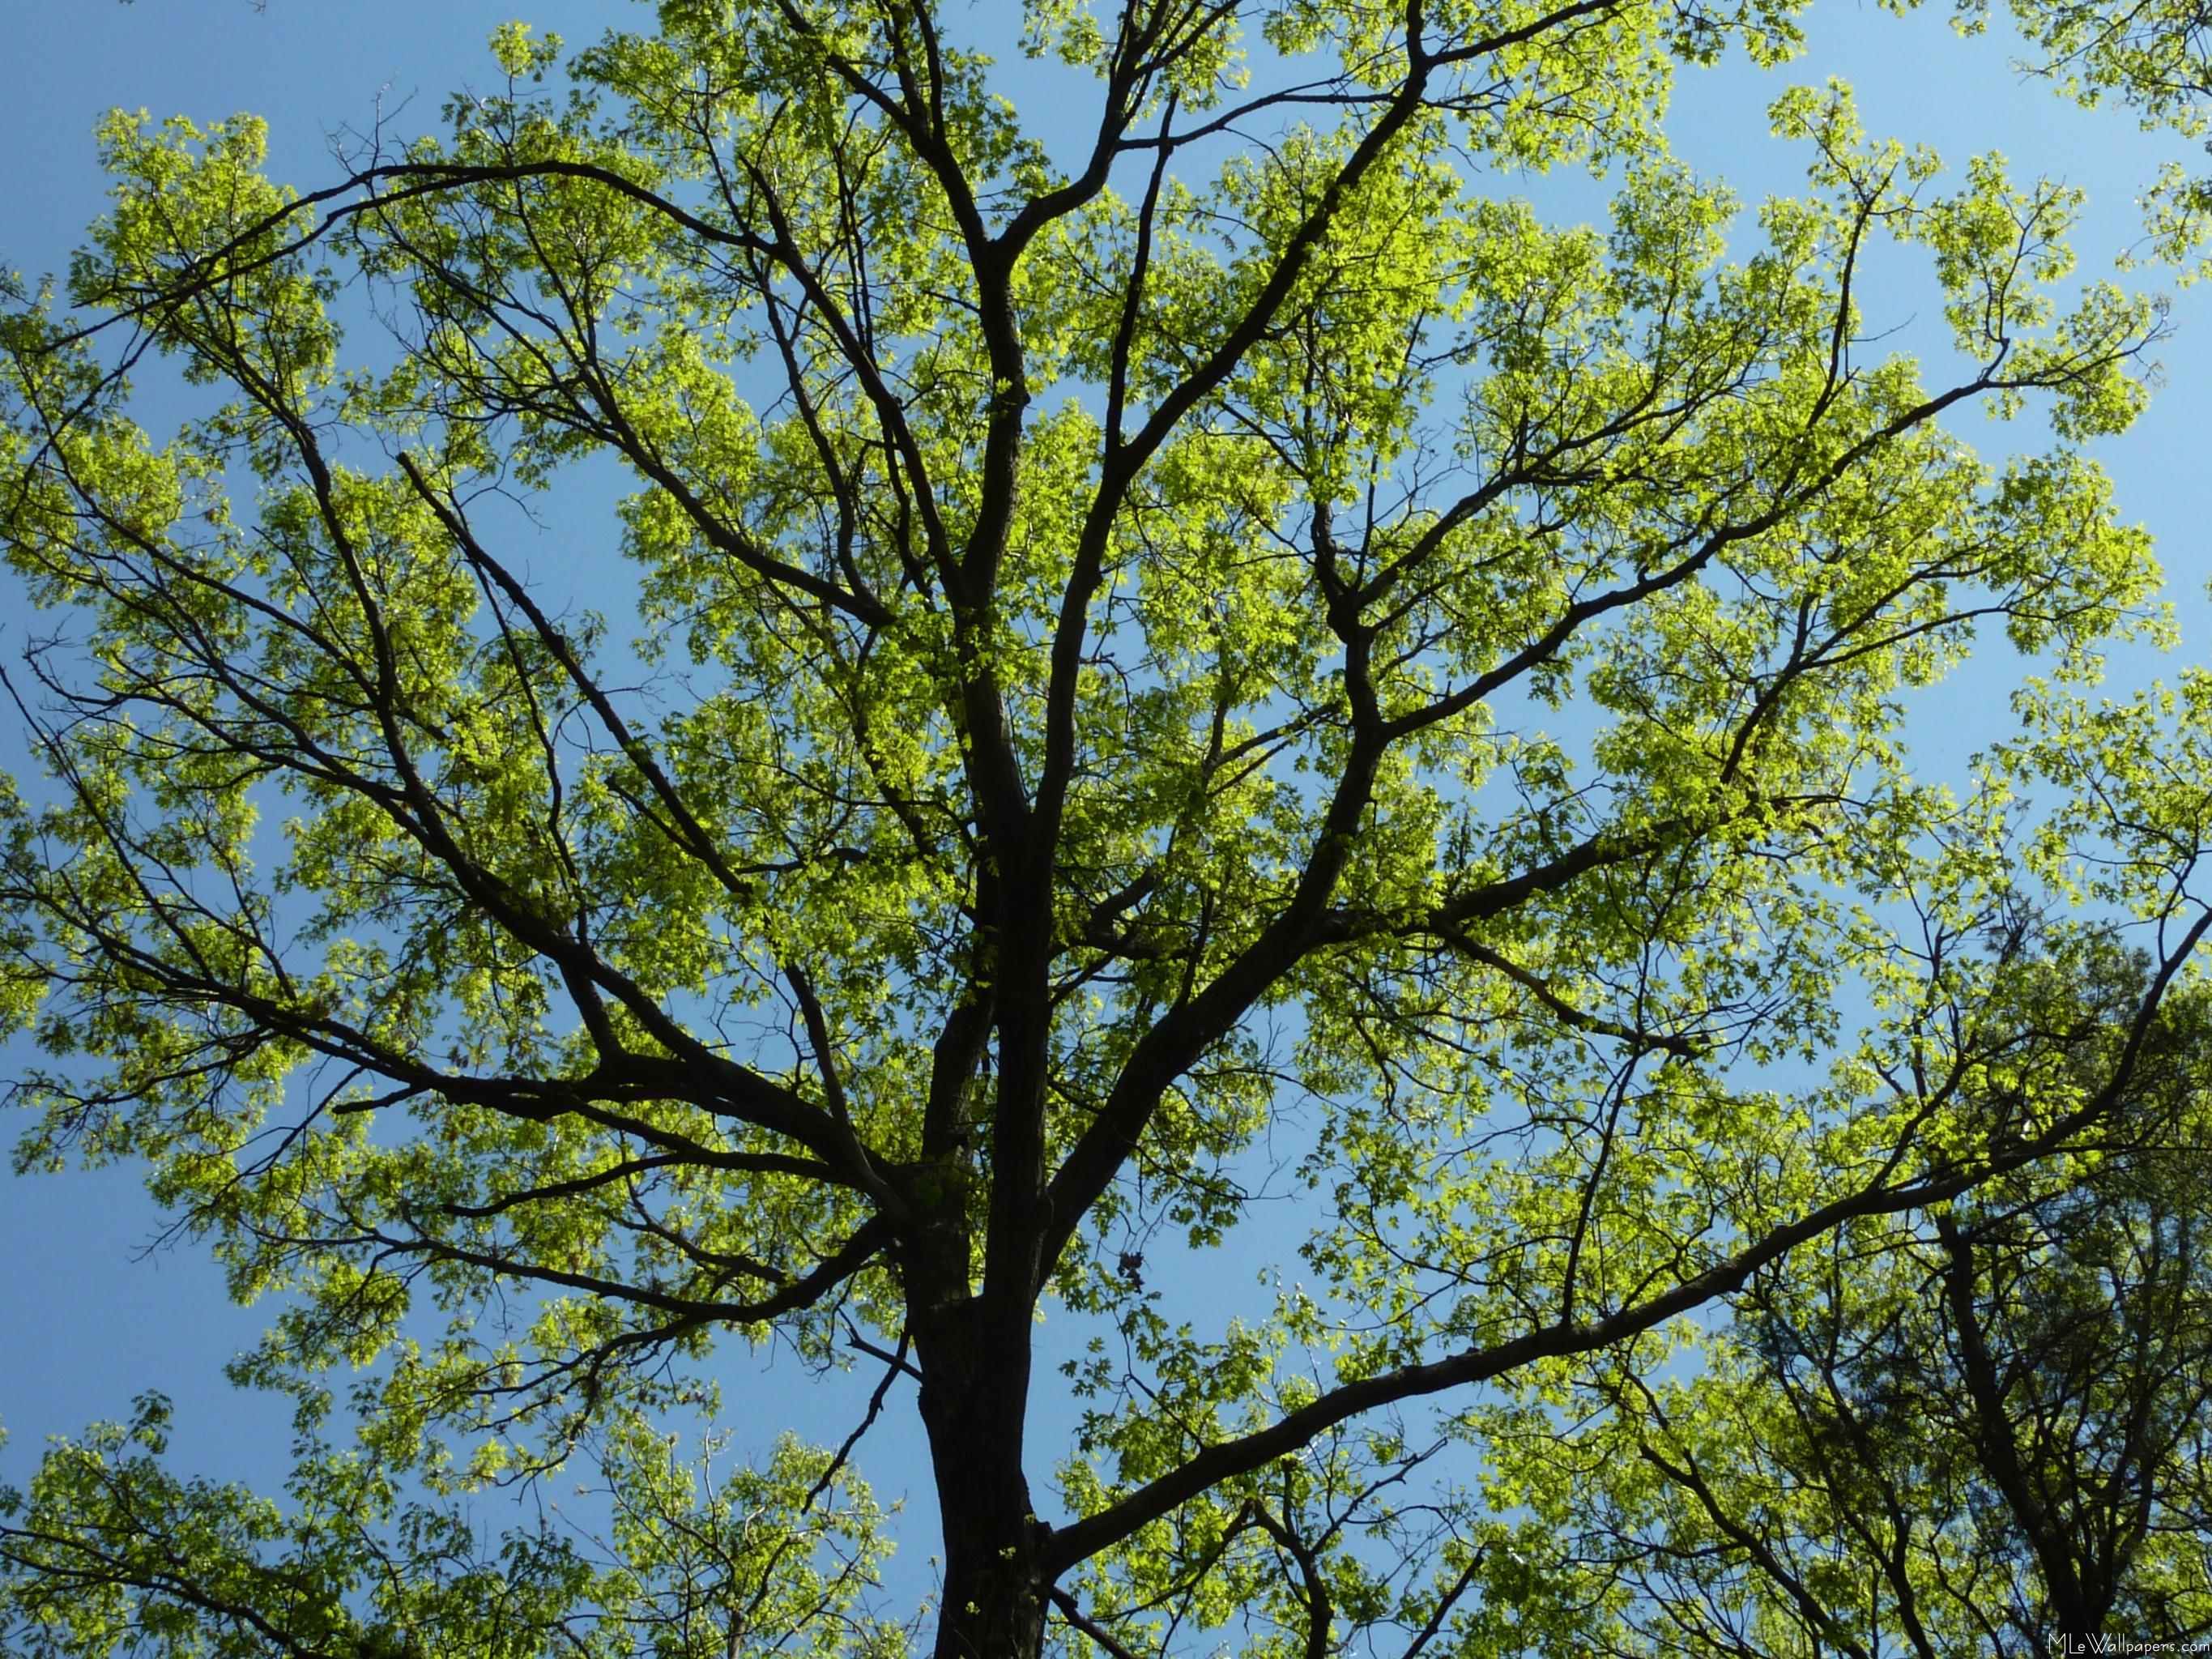 MLeWallpapers.com - Spring Oak Tree